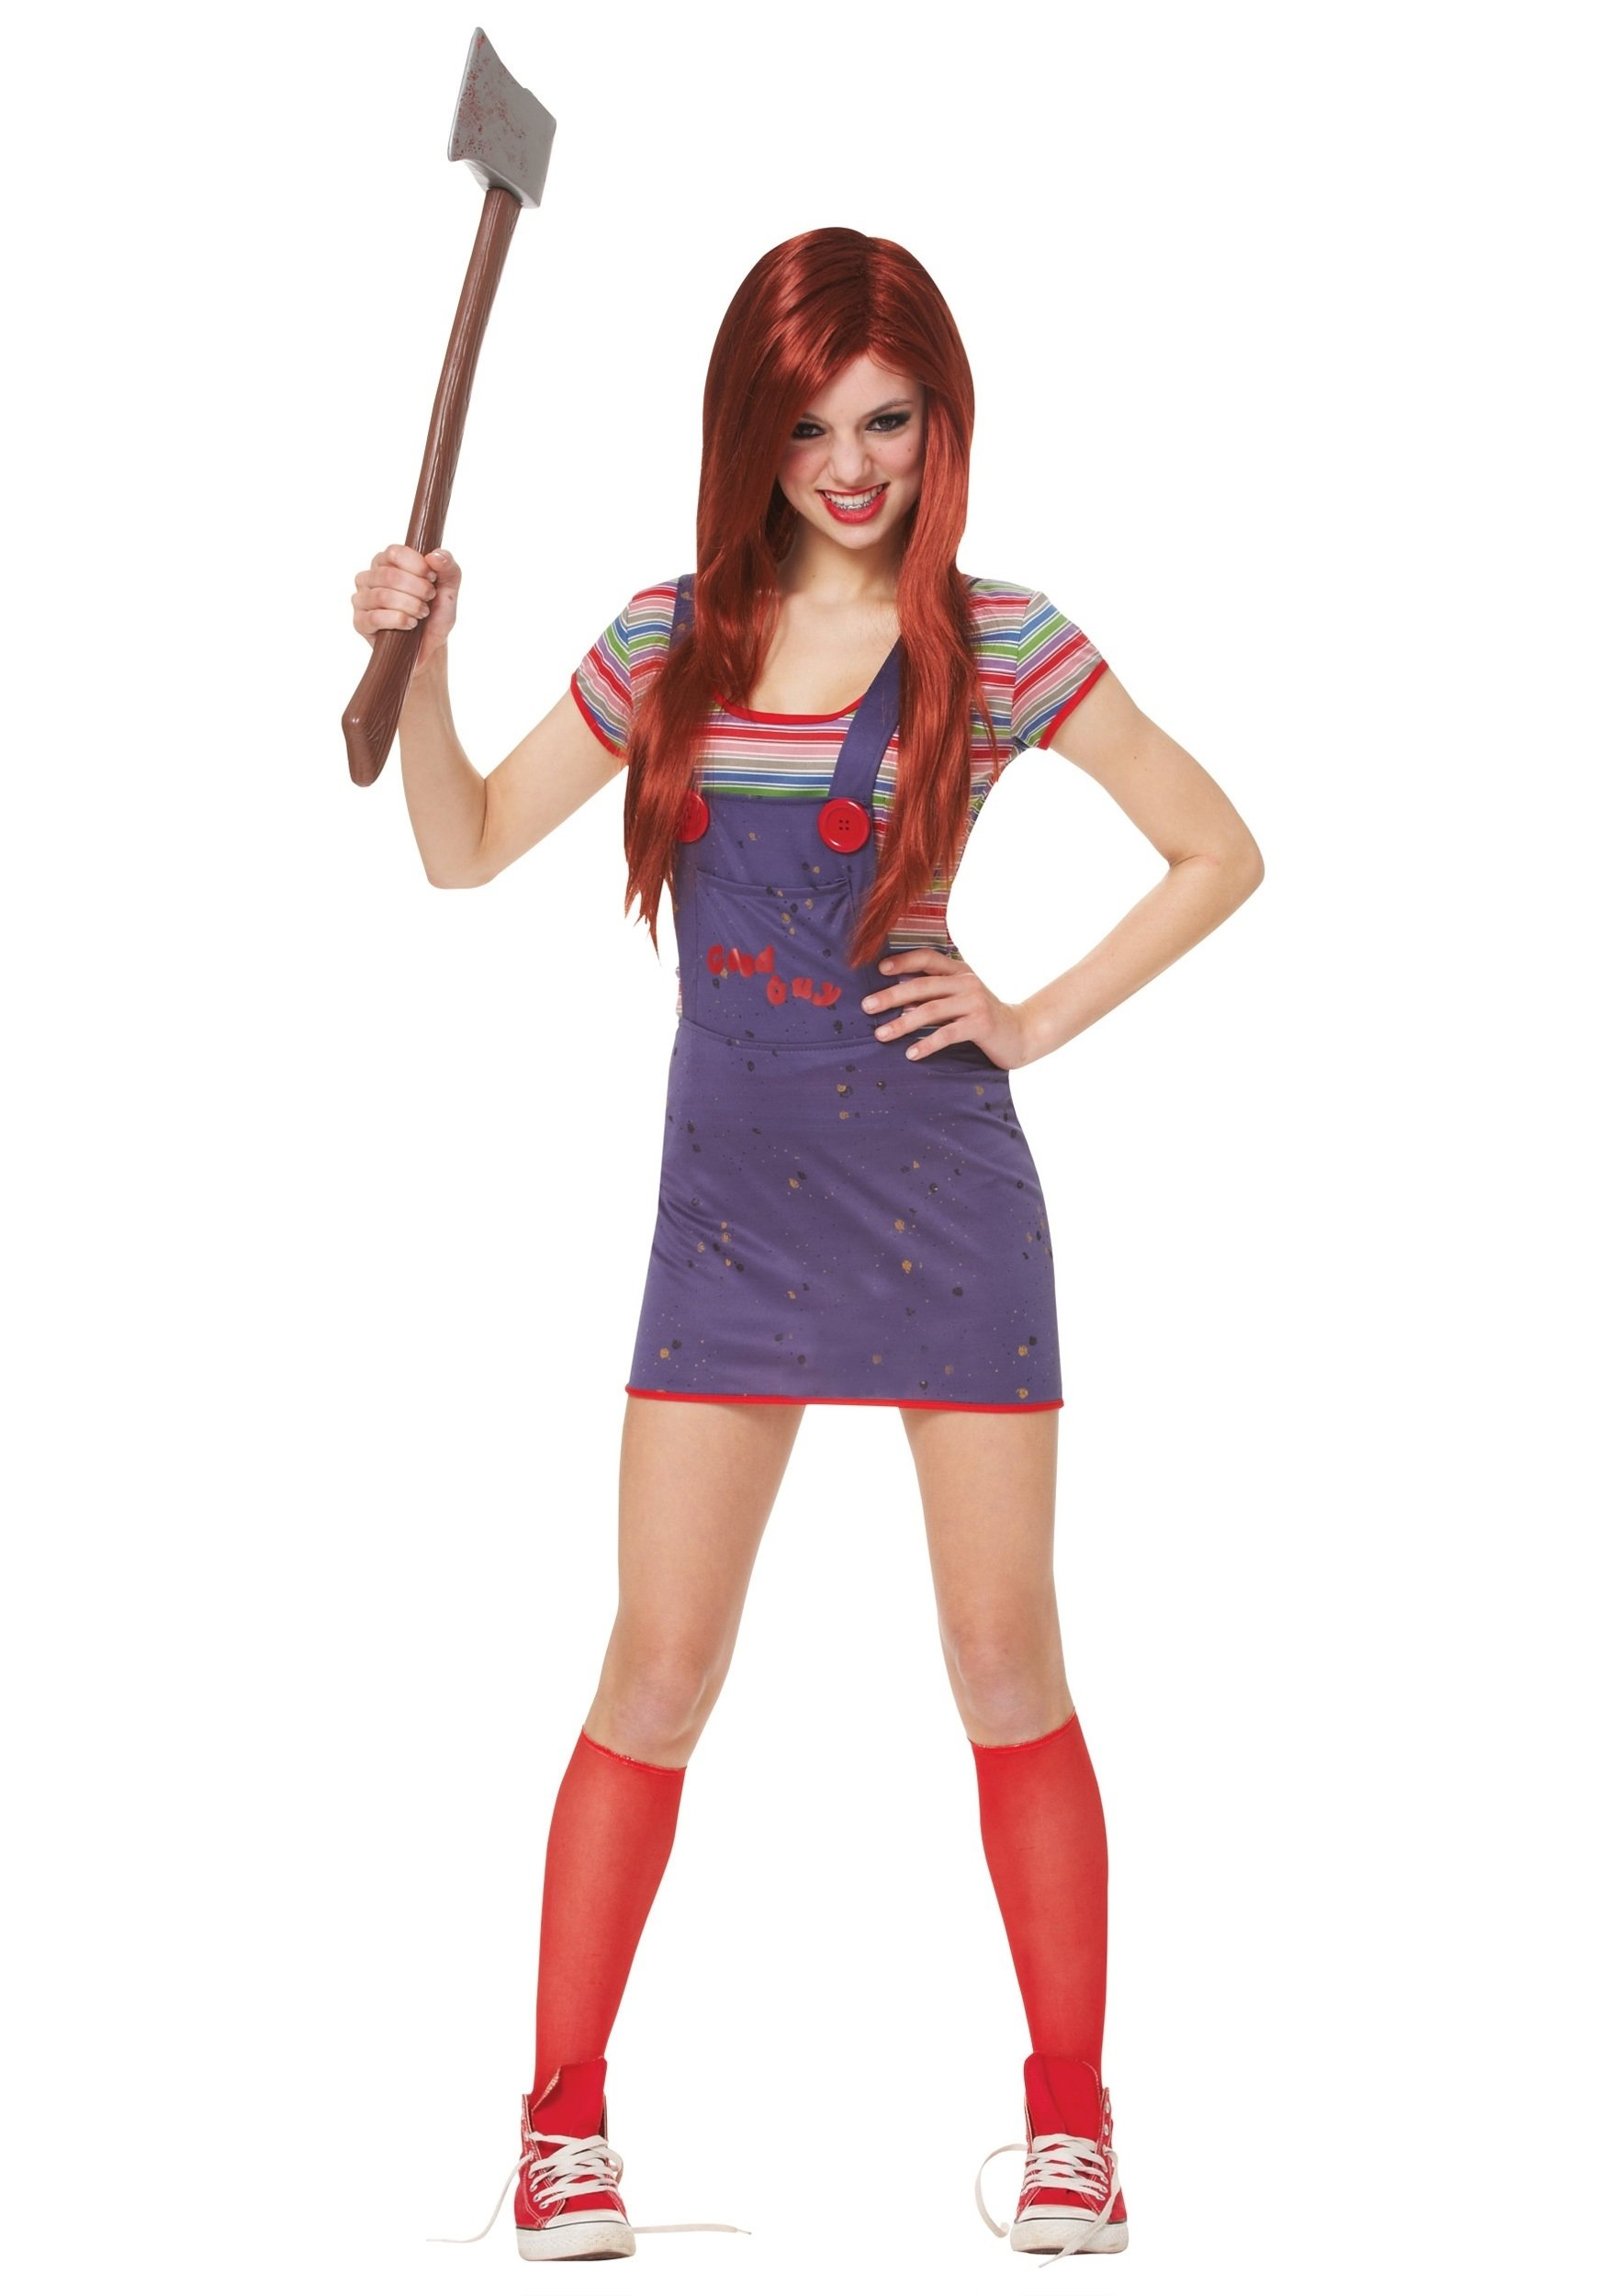 10 Wonderful Cool Halloween Costume Ideas For Girls scary halloween costumes cute halloween costumes for teenage girls 2020